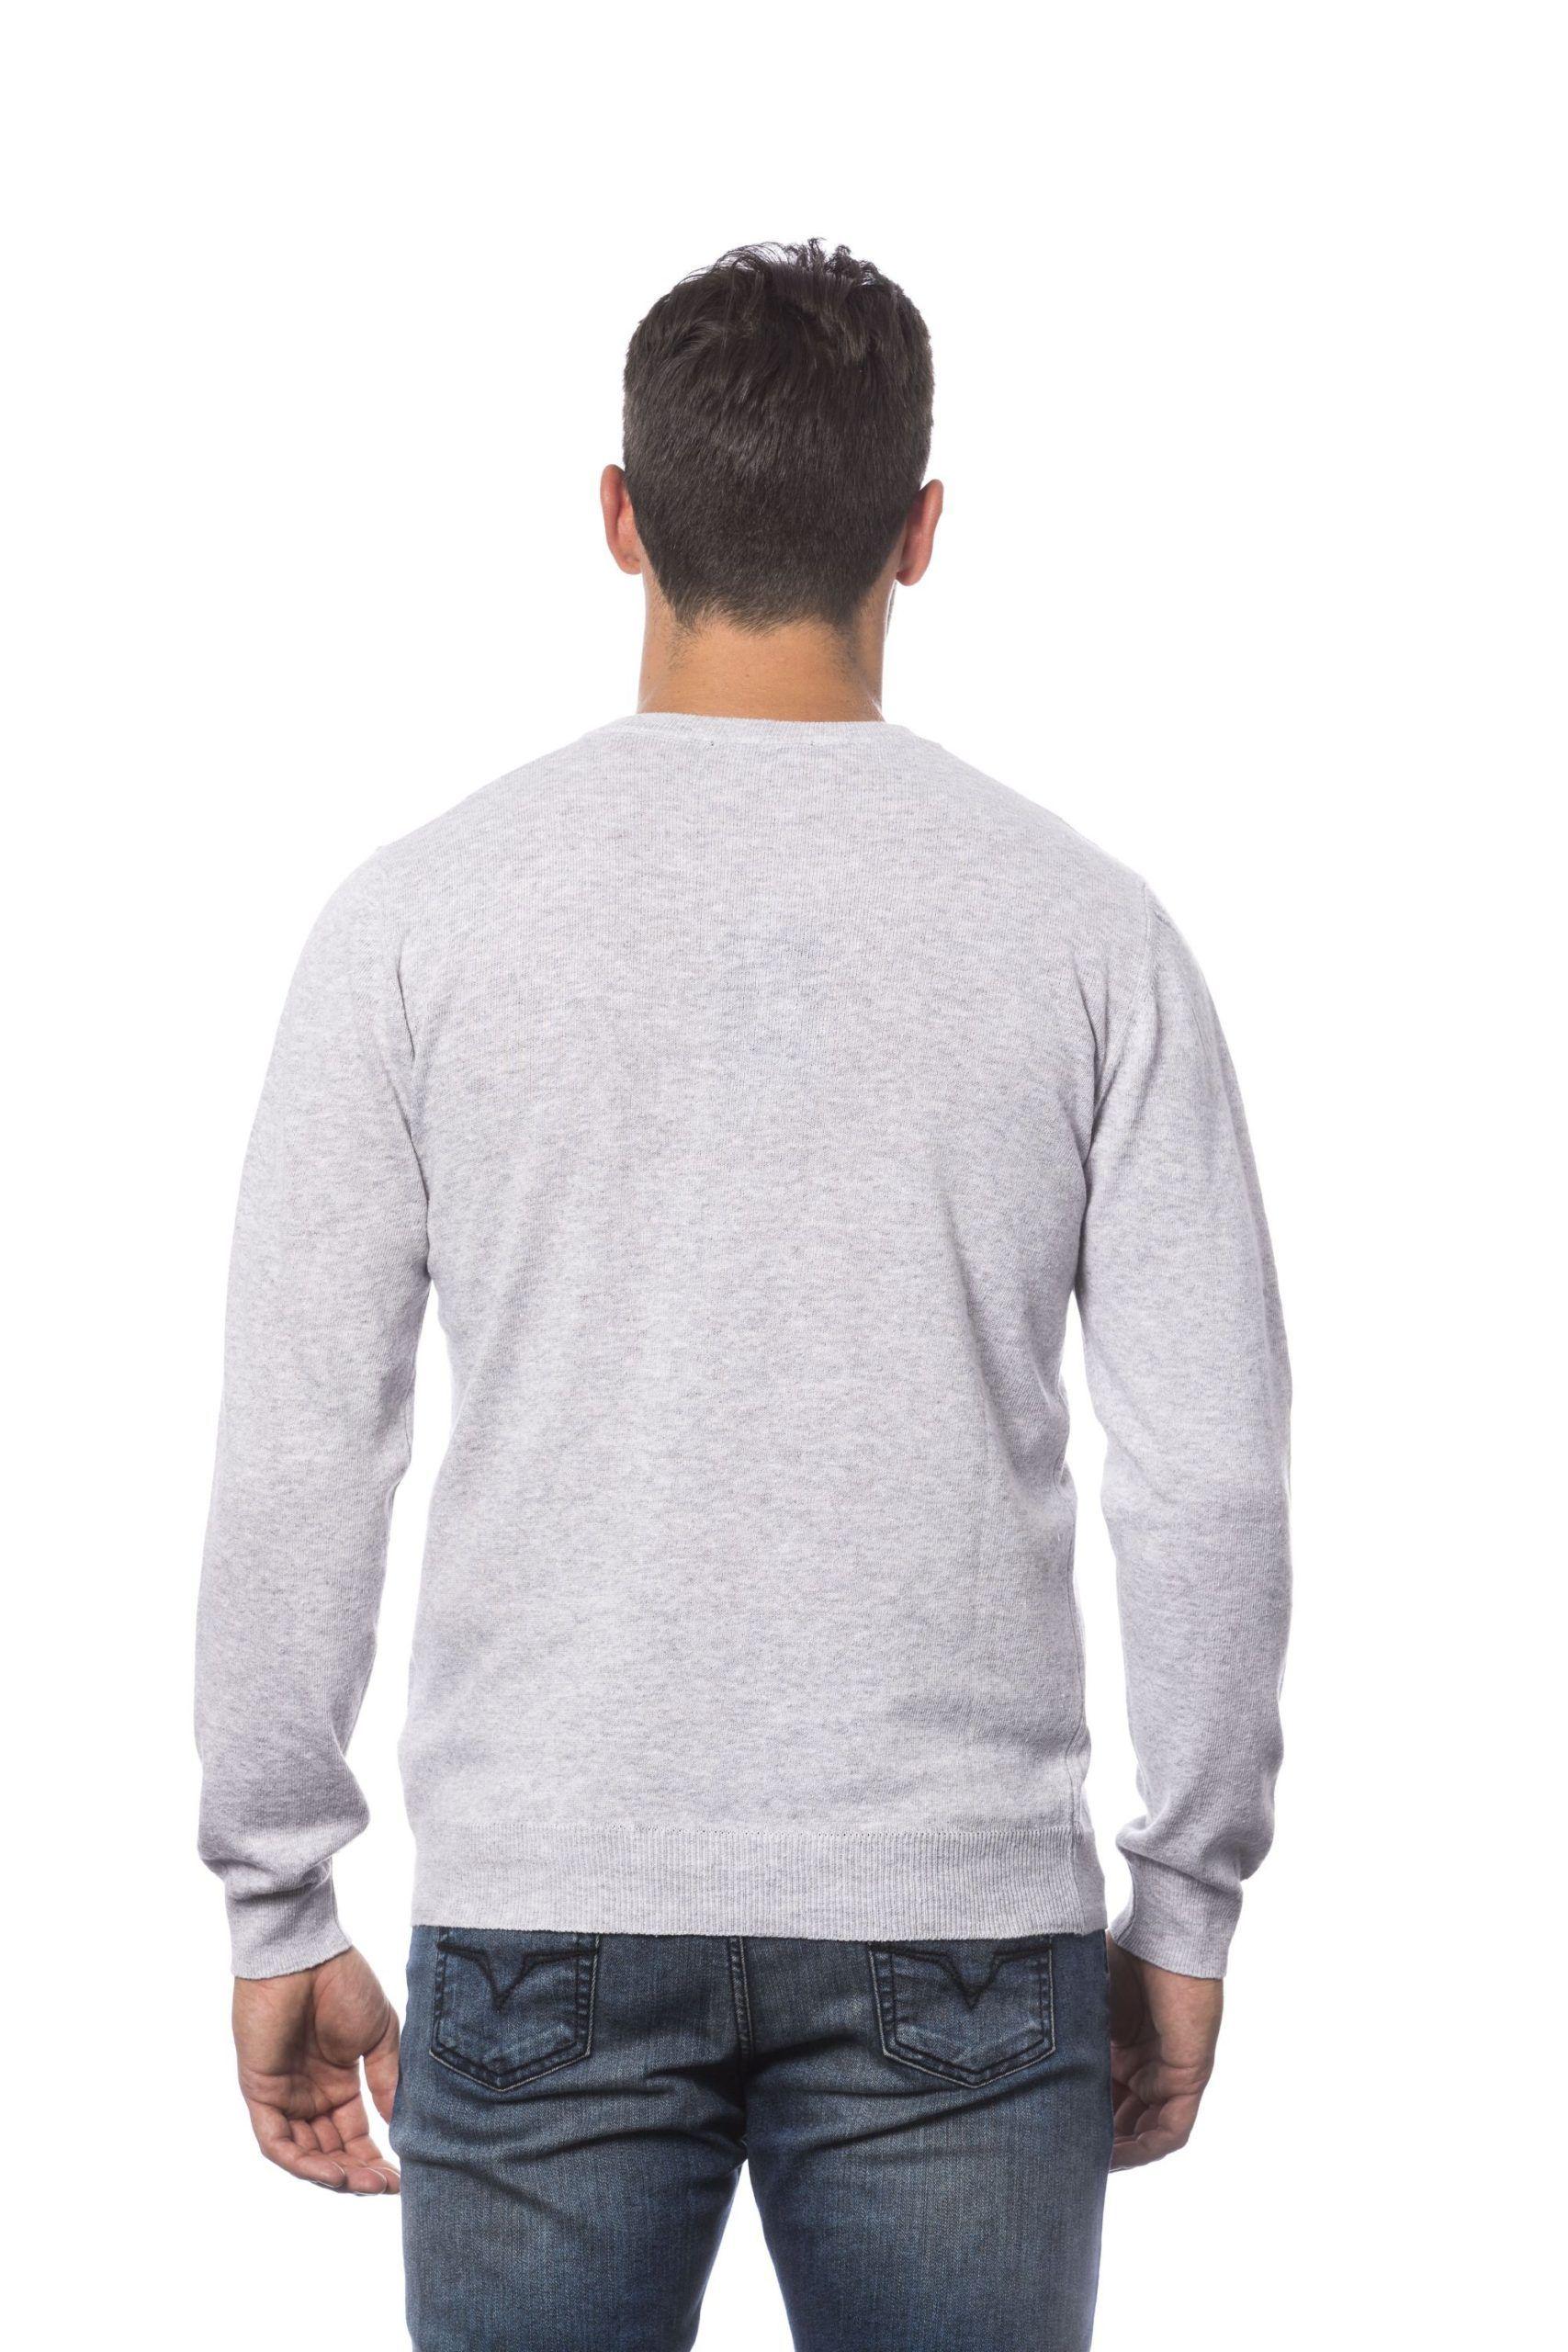 Roberto Cavalli Sport Grigiomelange Sweater